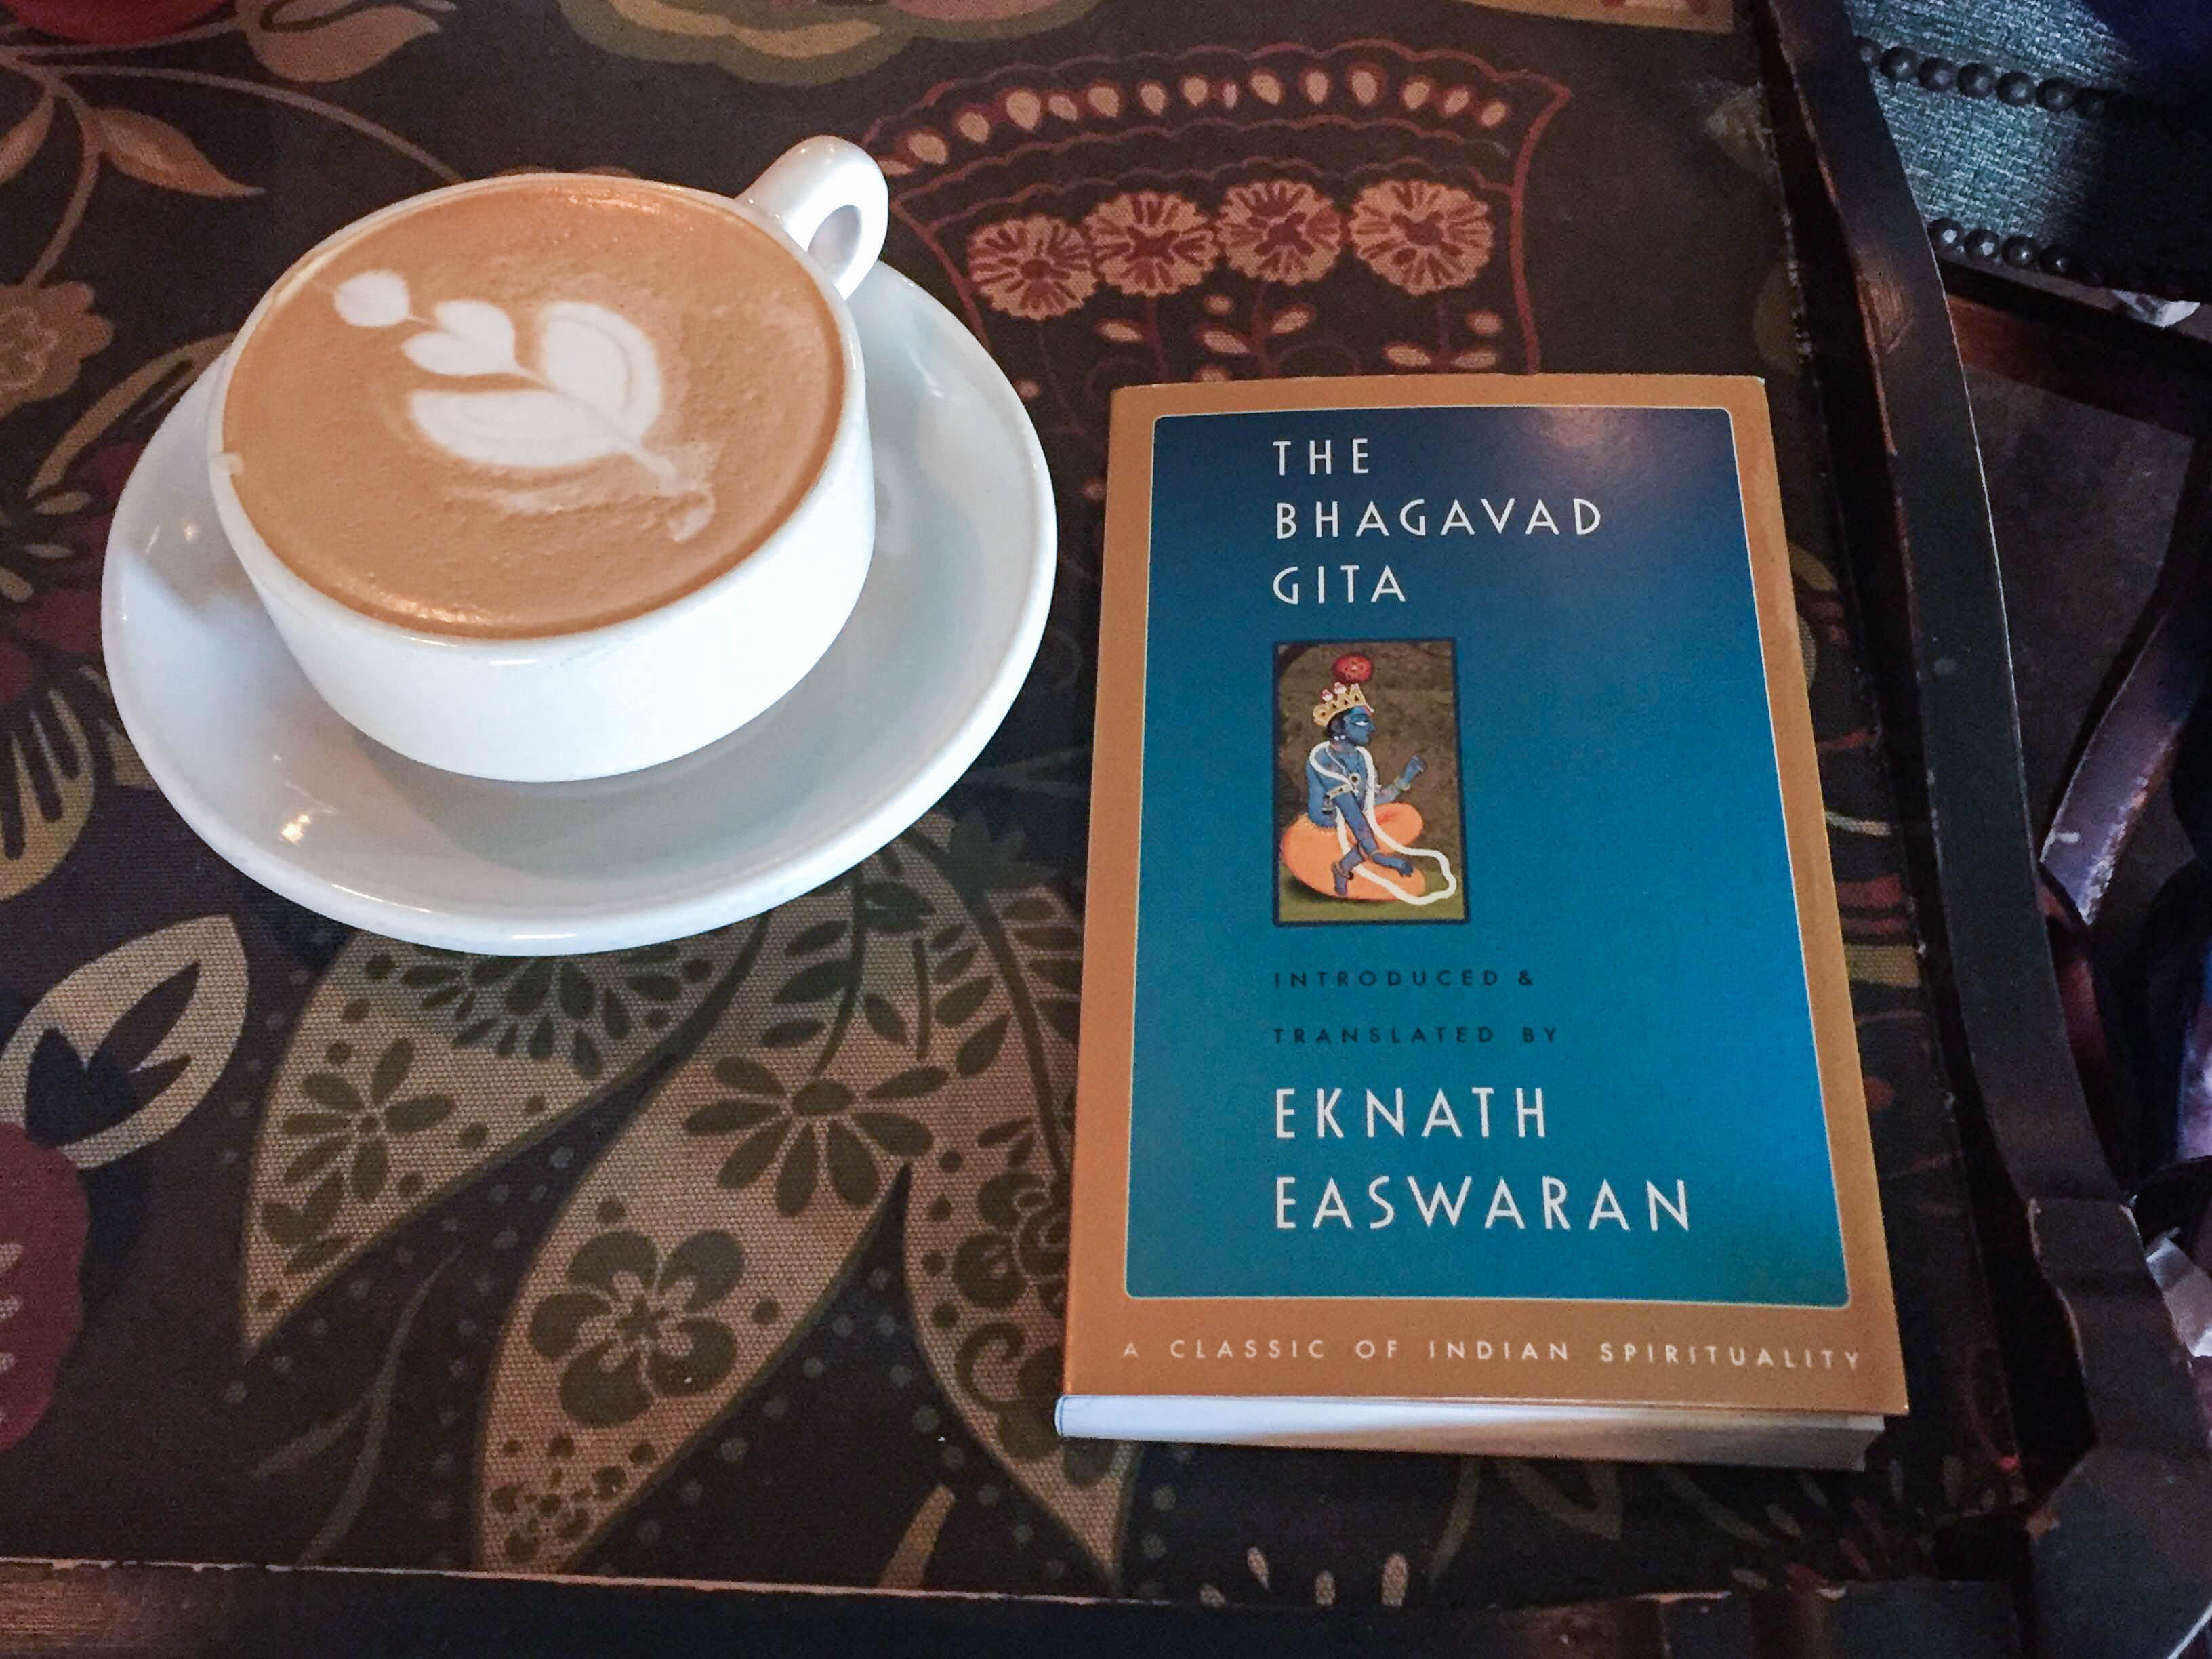 Coffee and The Bhagavad Gita